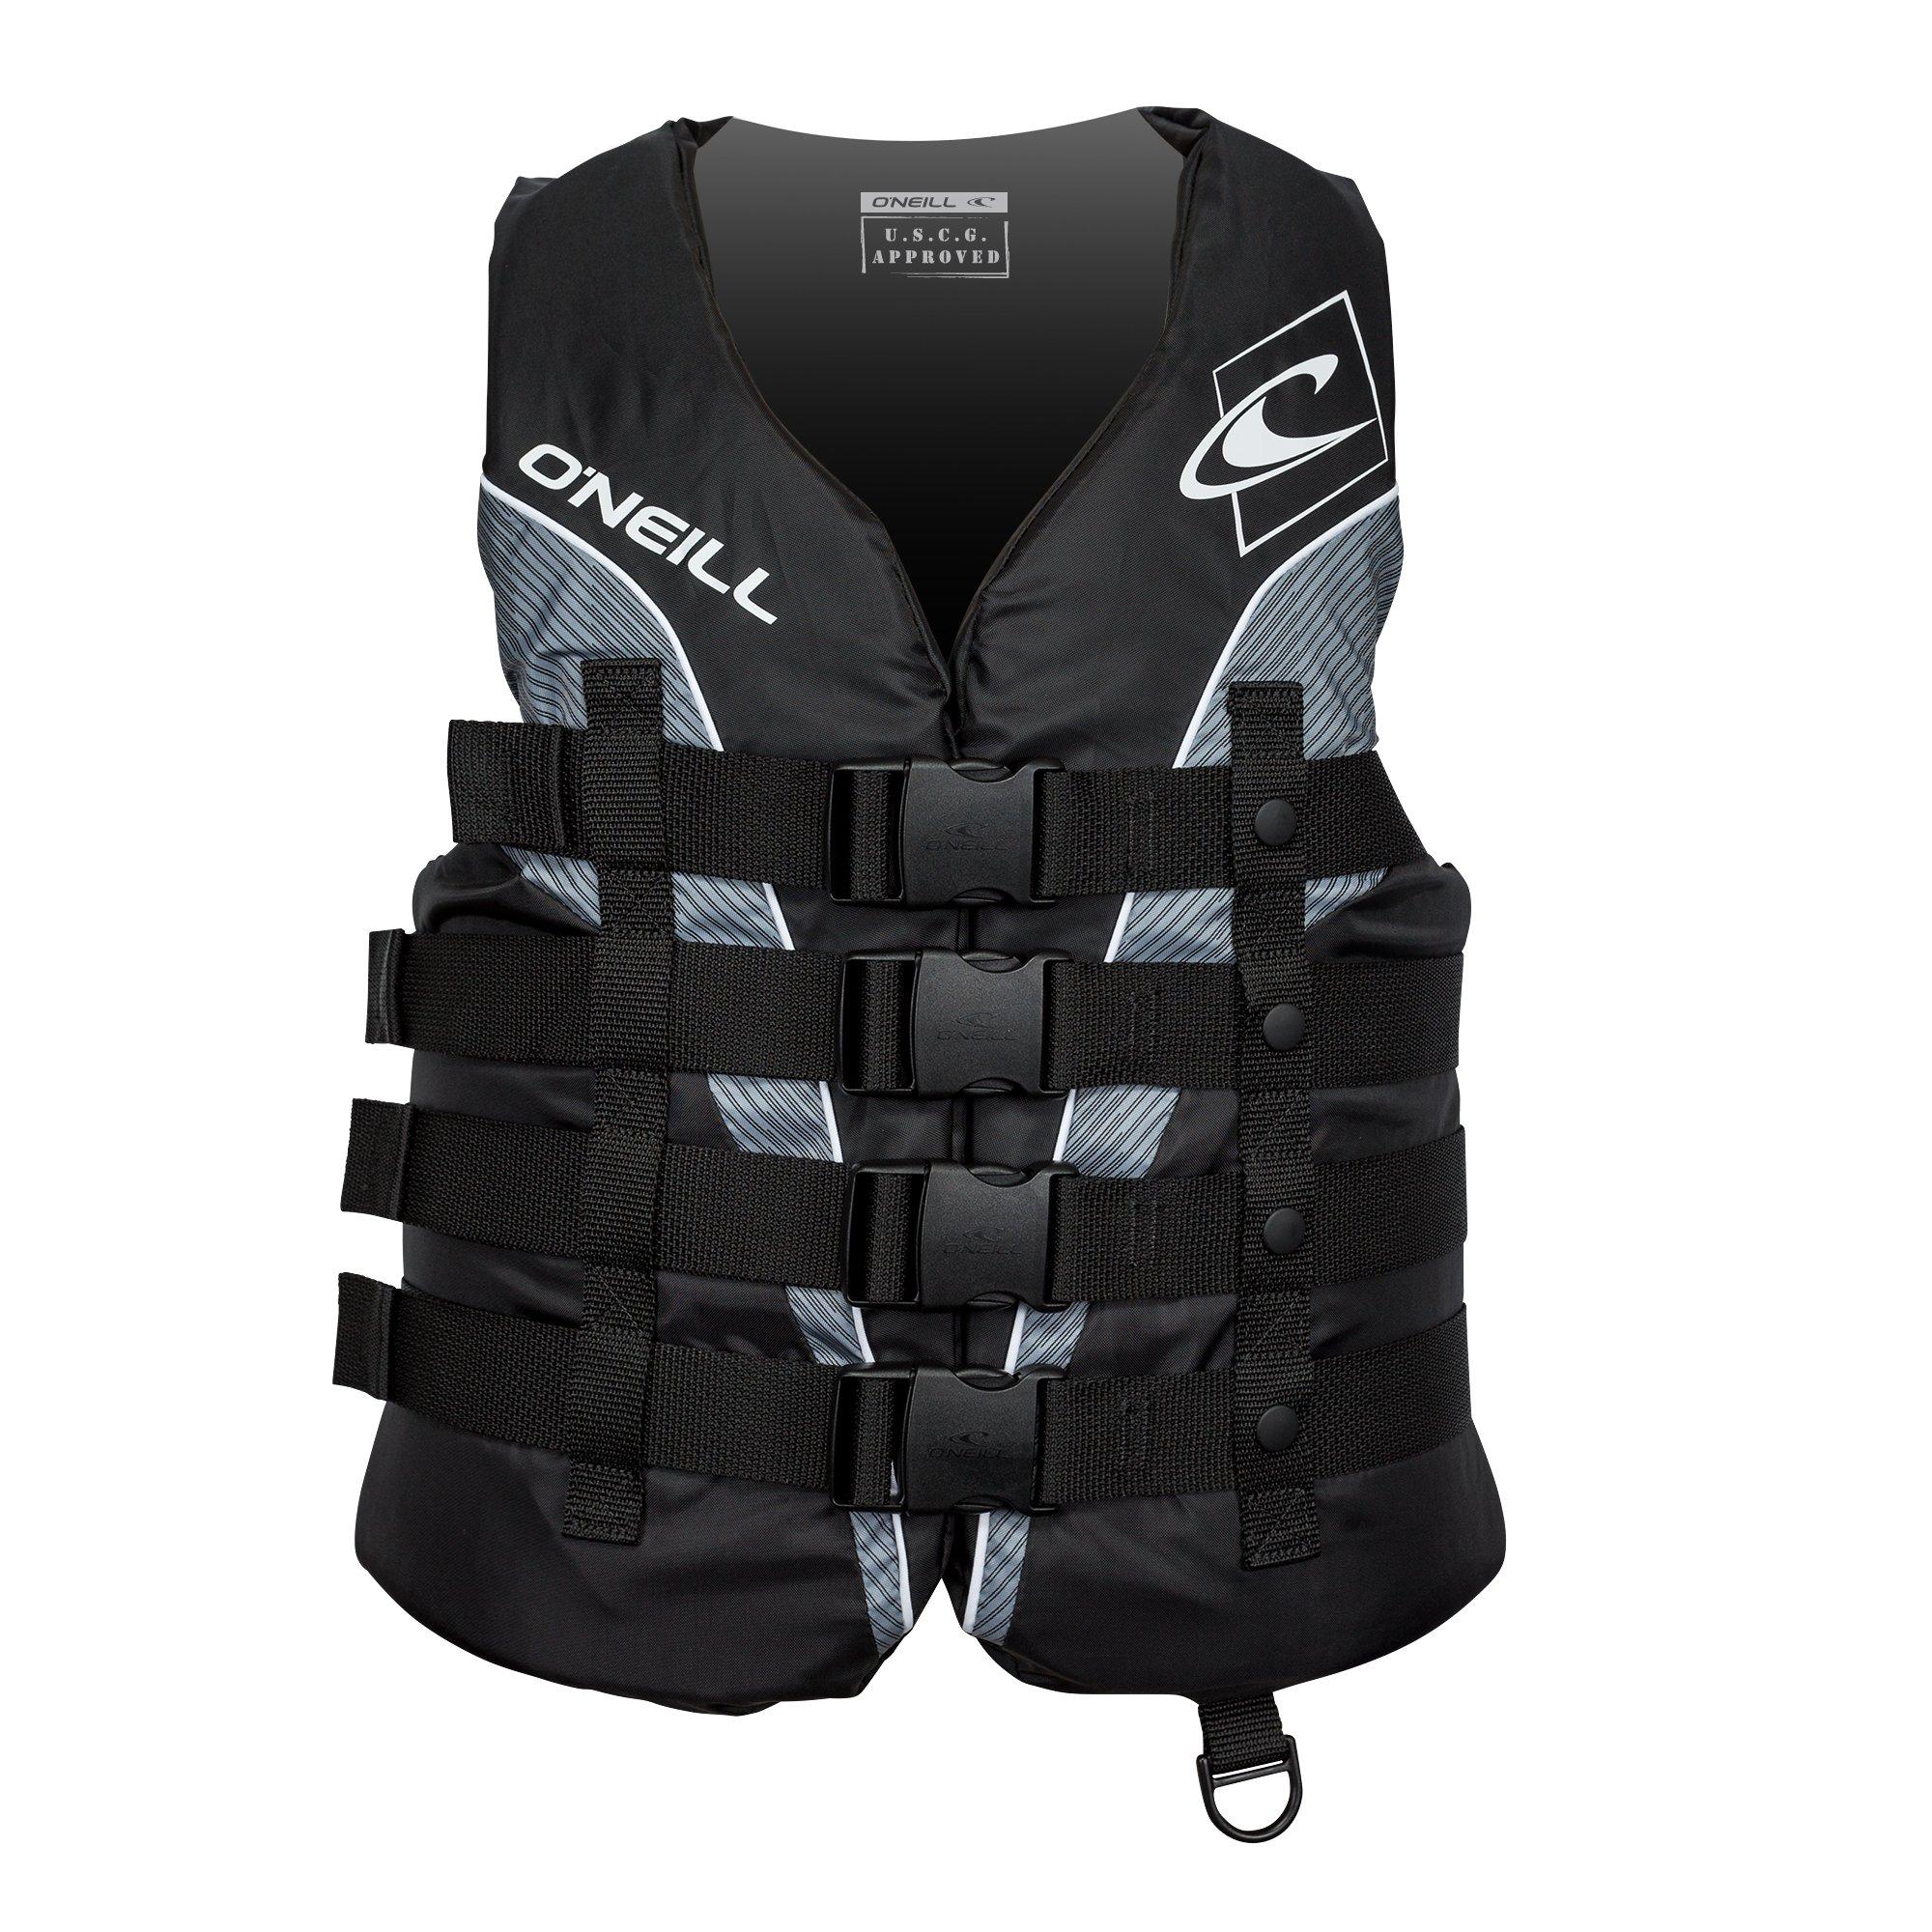 O'Neill   Men's Superlite USCG Life Vest ,Black/Black/Smoke/White,Medium by O'Neill Wetsuits (Image #1)